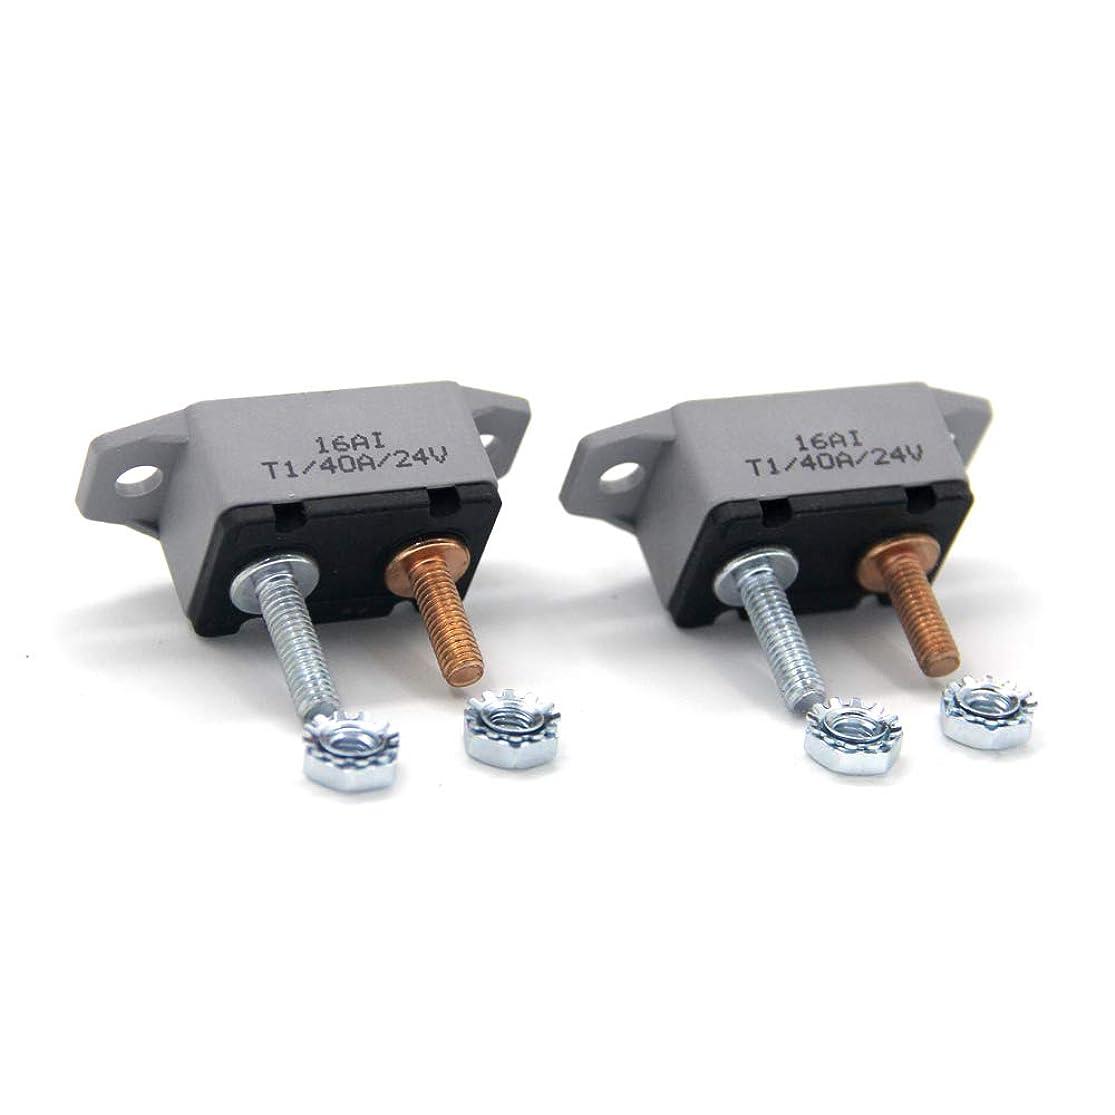 ZOOKOTO 2pcs 12-24V 40 Amp ATV AUTO Resettable Circuit Breaker Fuse holder 40A liibtstl2